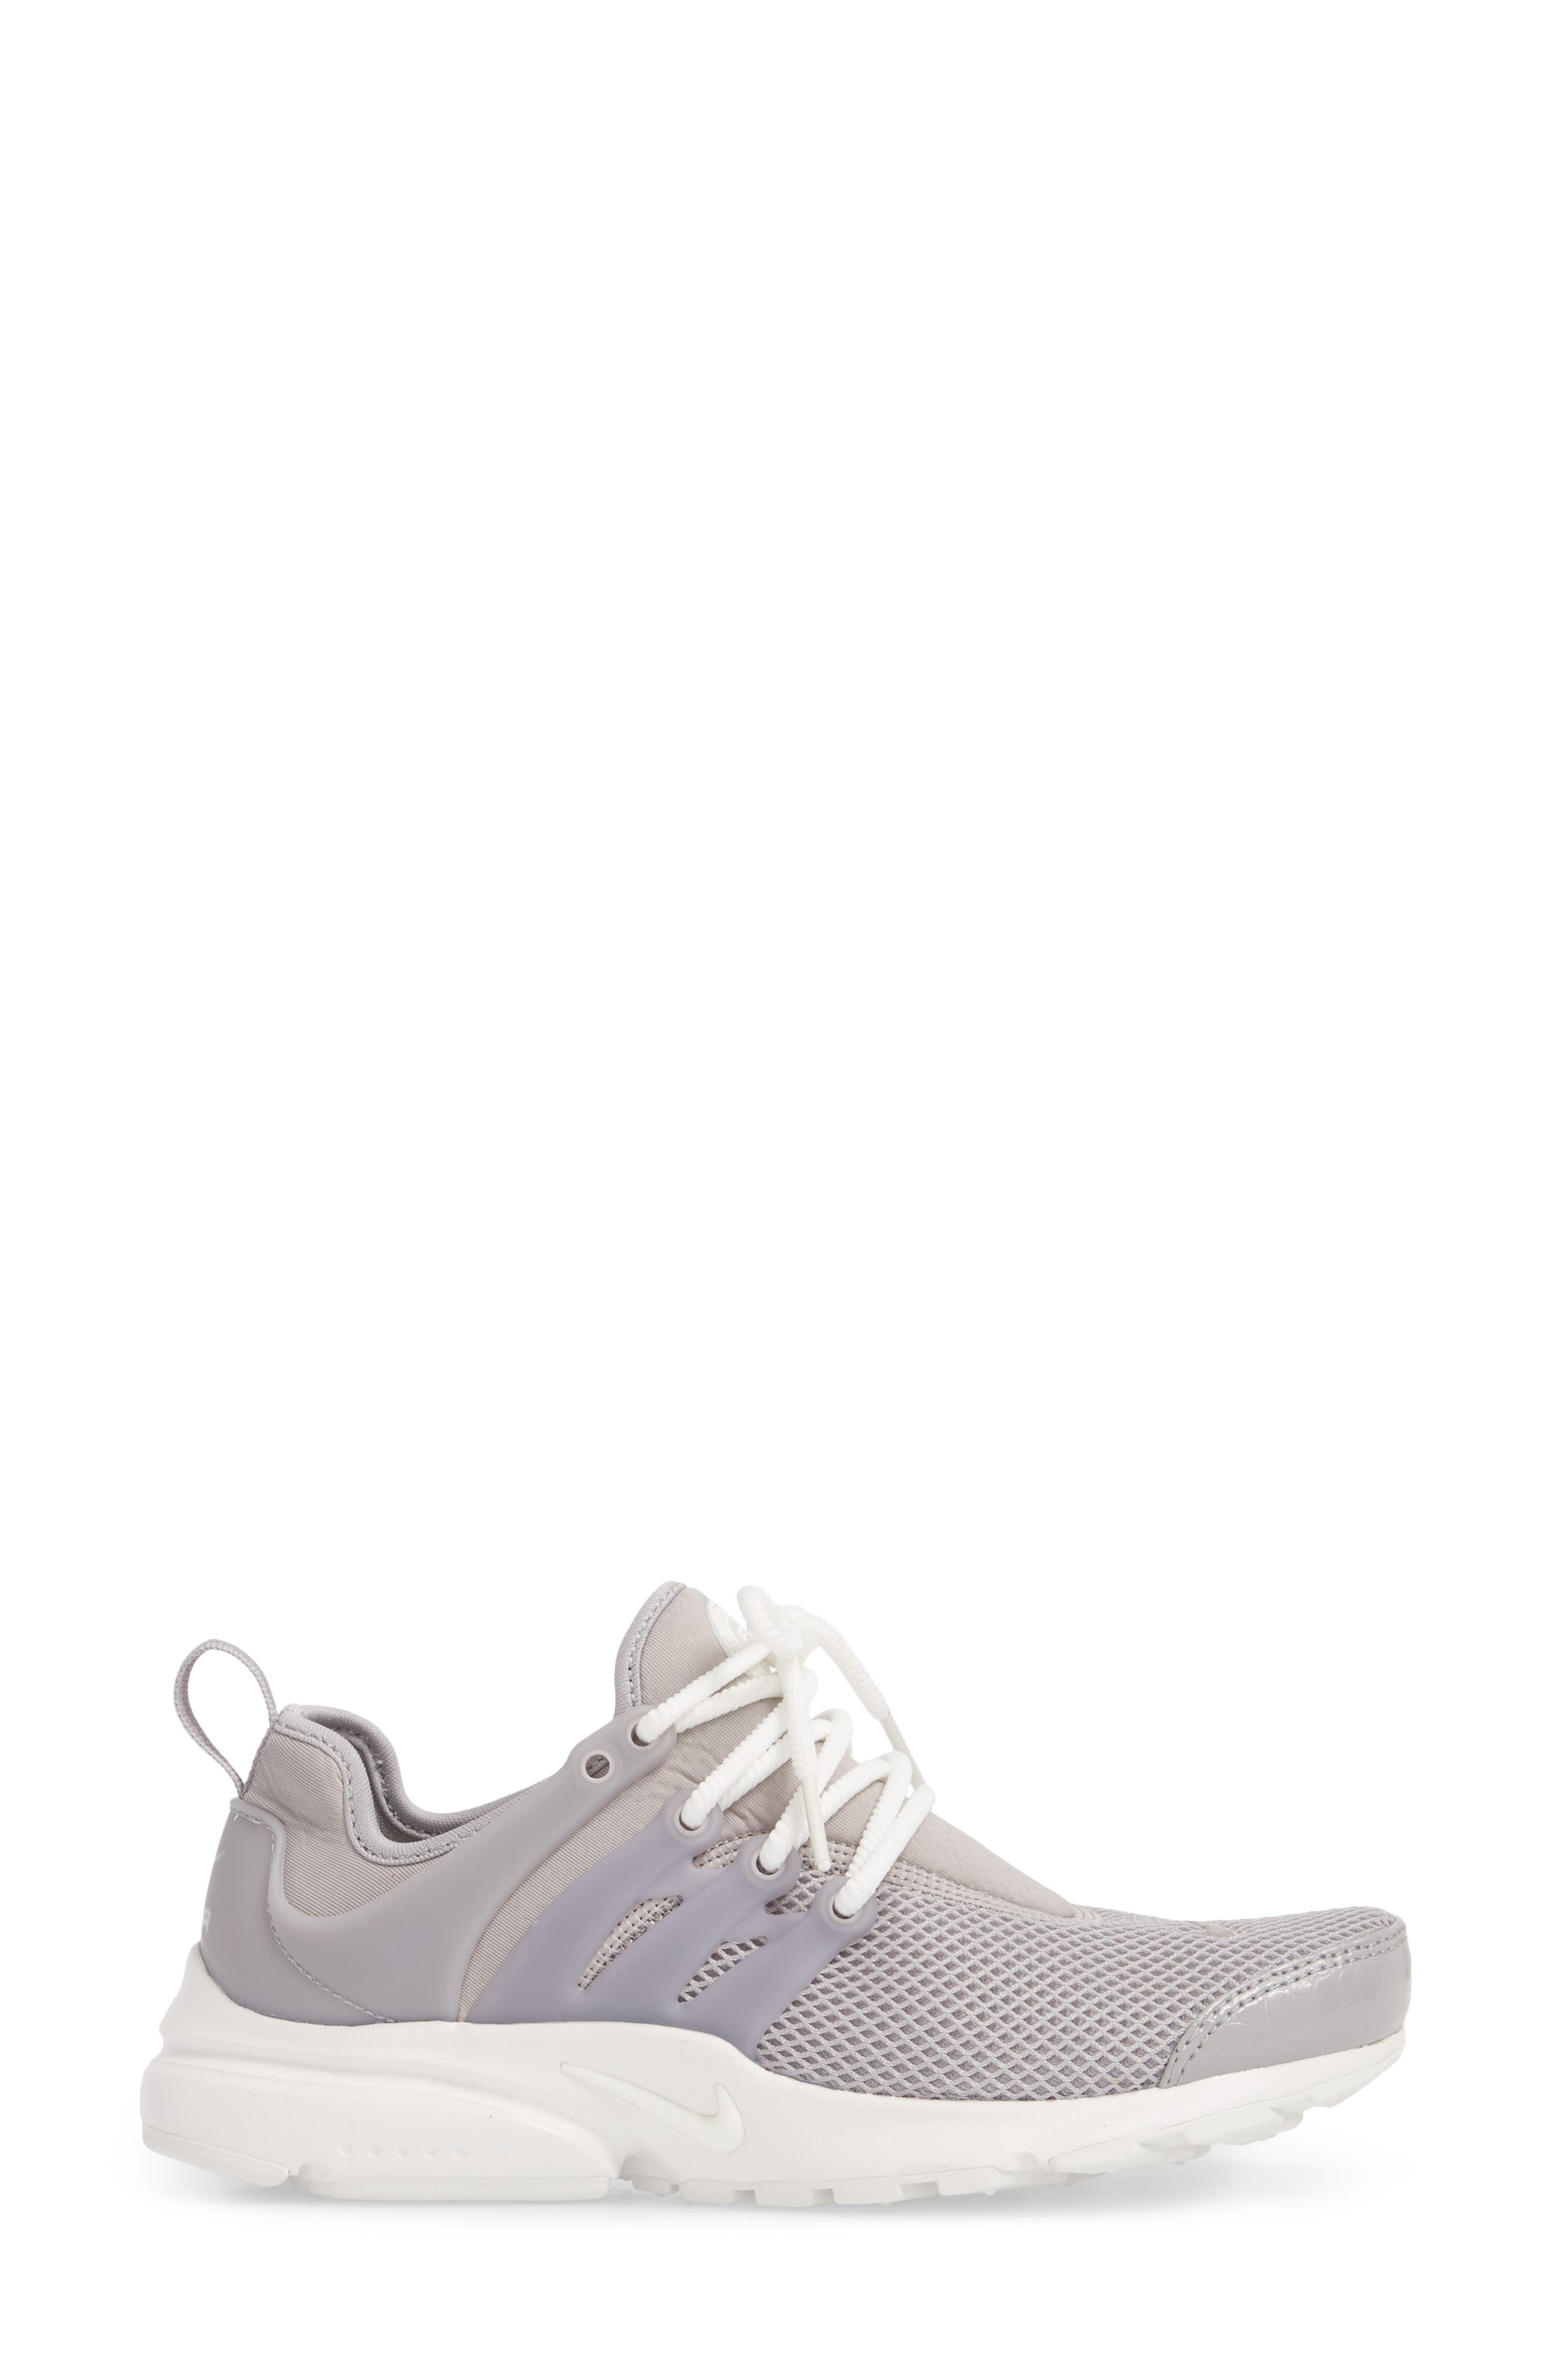 Air Presto SE Sneaker,                             Alternate thumbnail 3, color,                             021